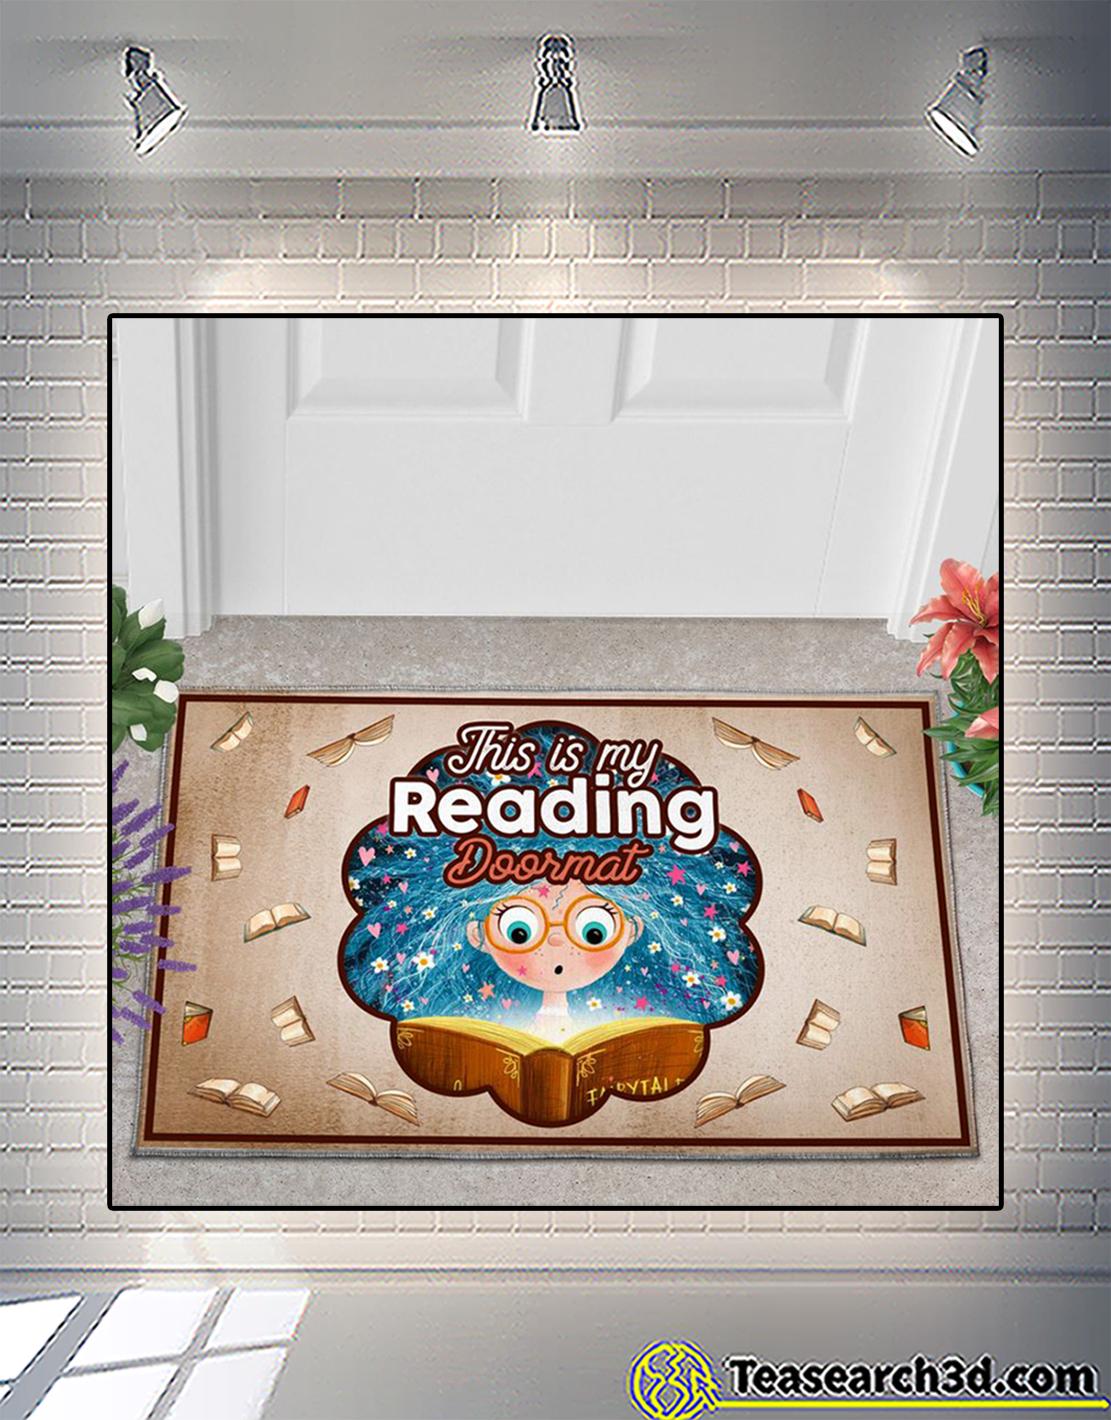 This is my reading doormat 2